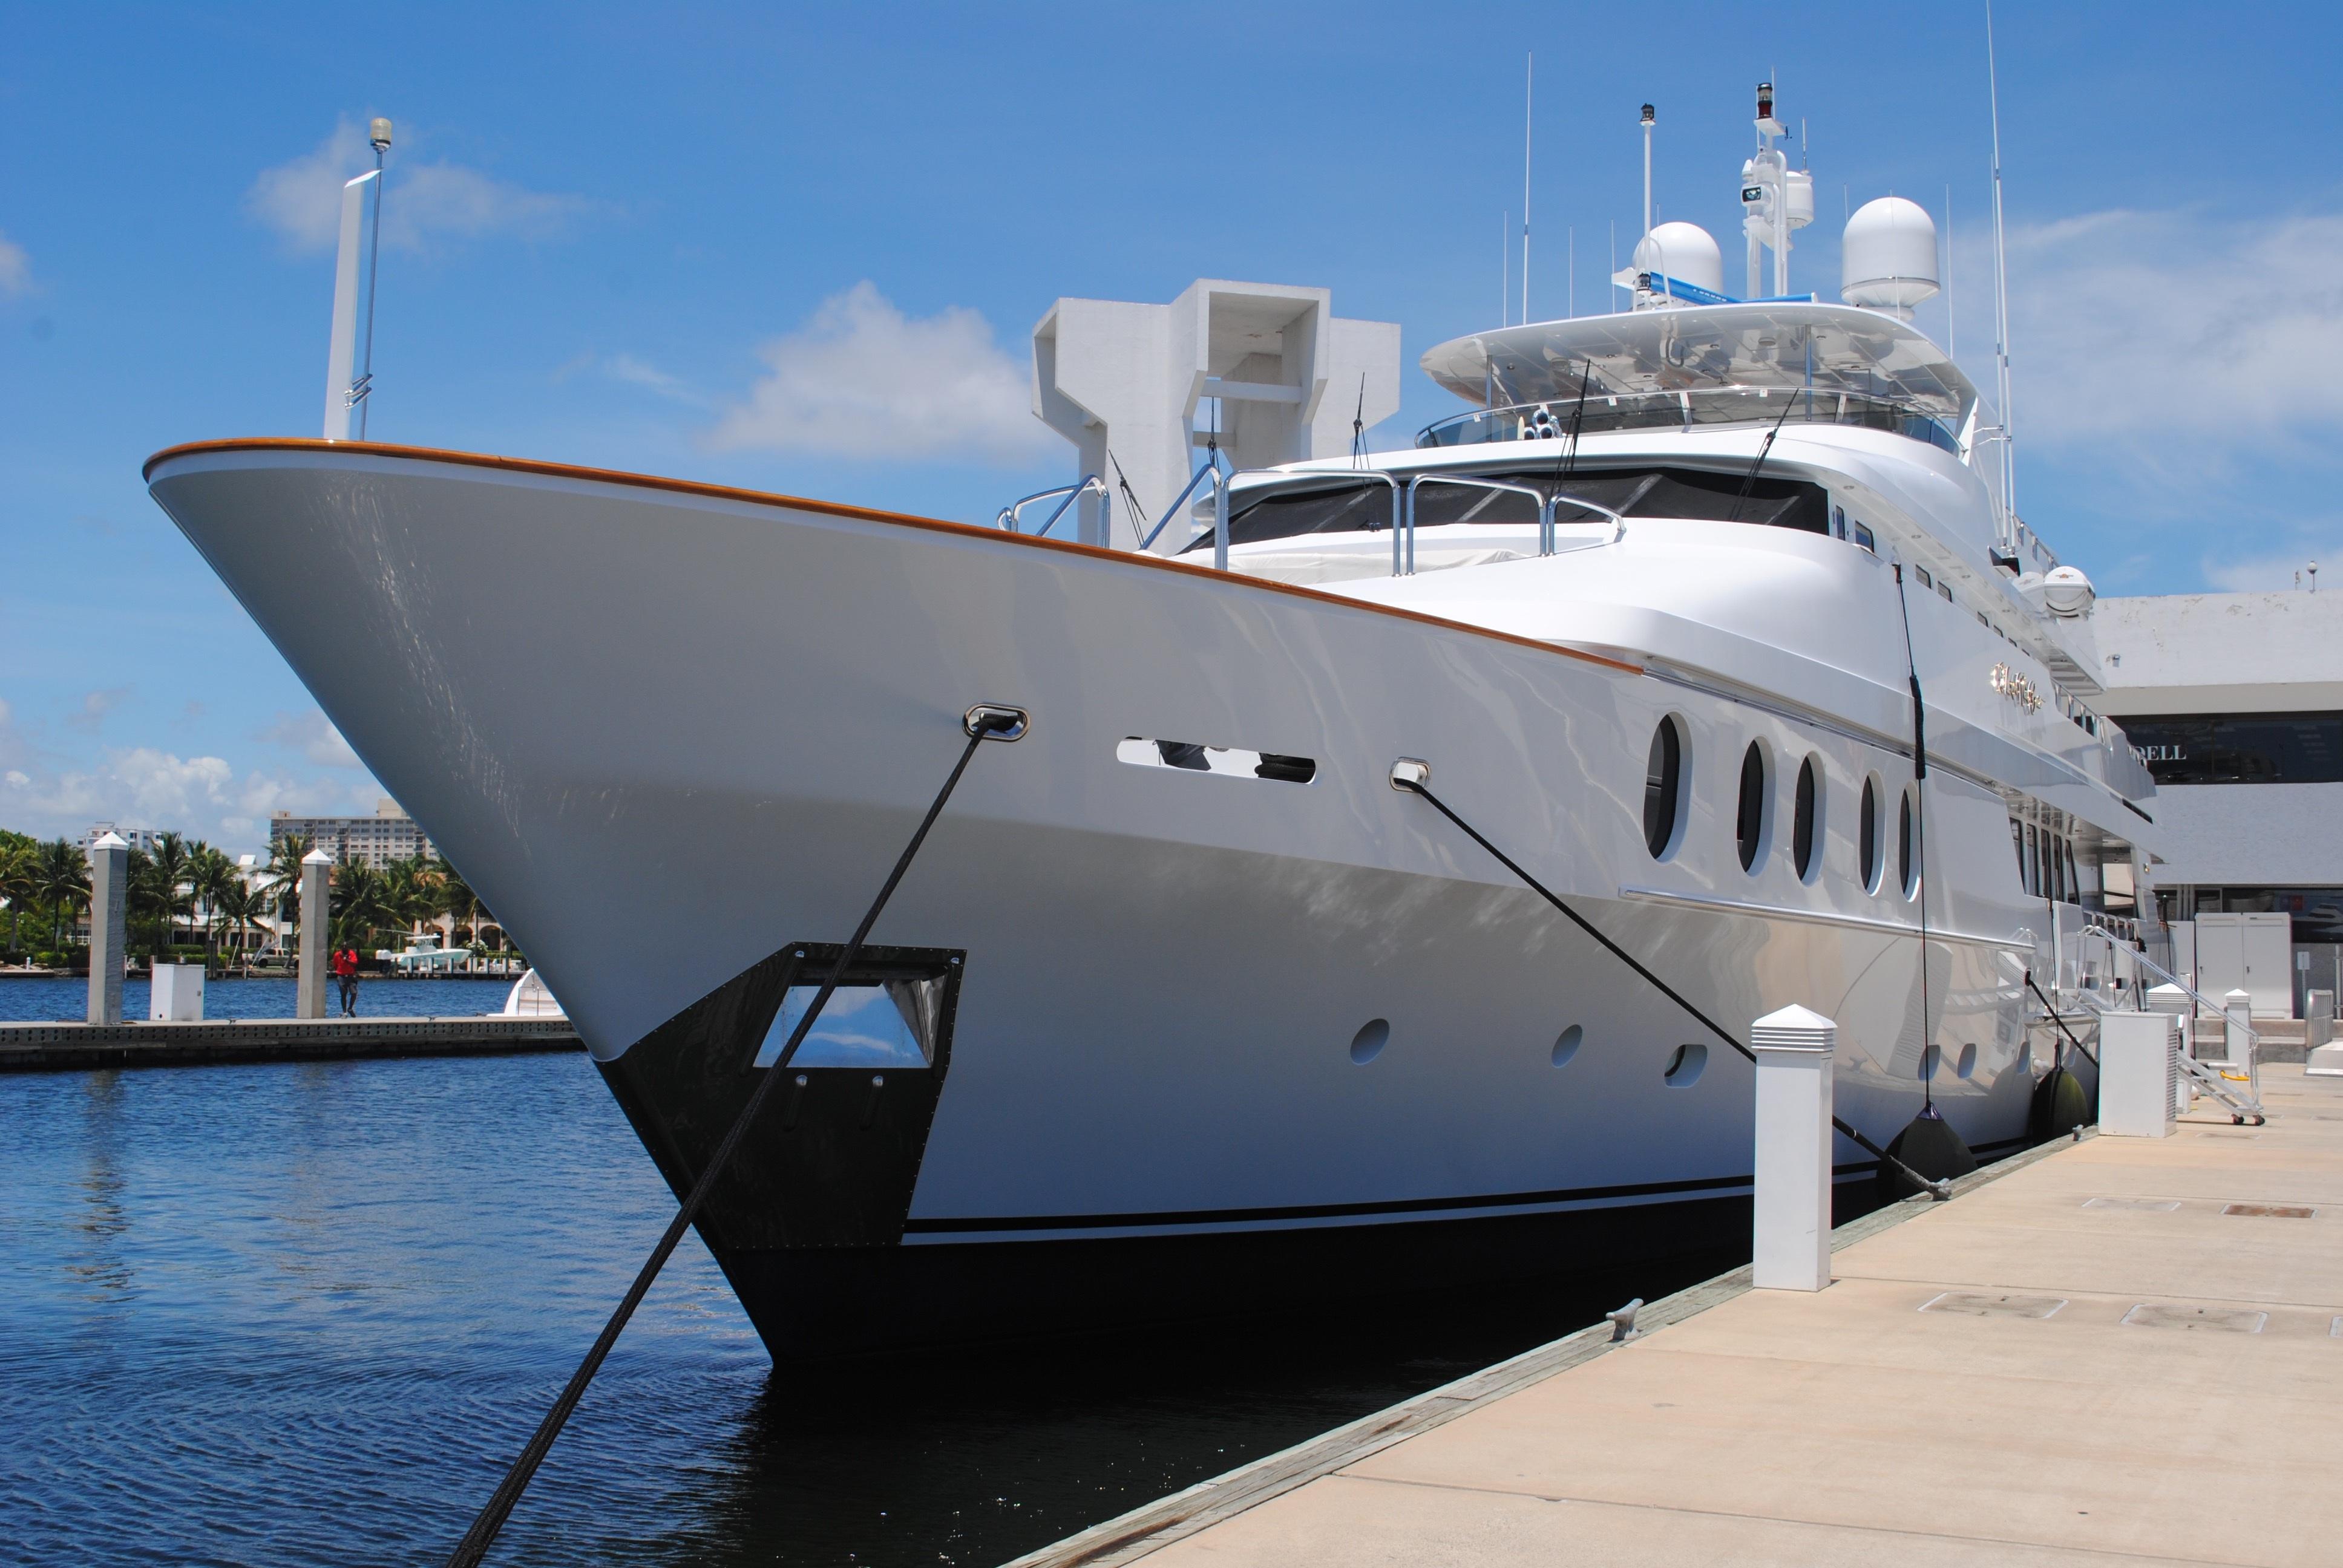 Free Images Sea Water Ocean Dock Deck Boat Travel Vehicle